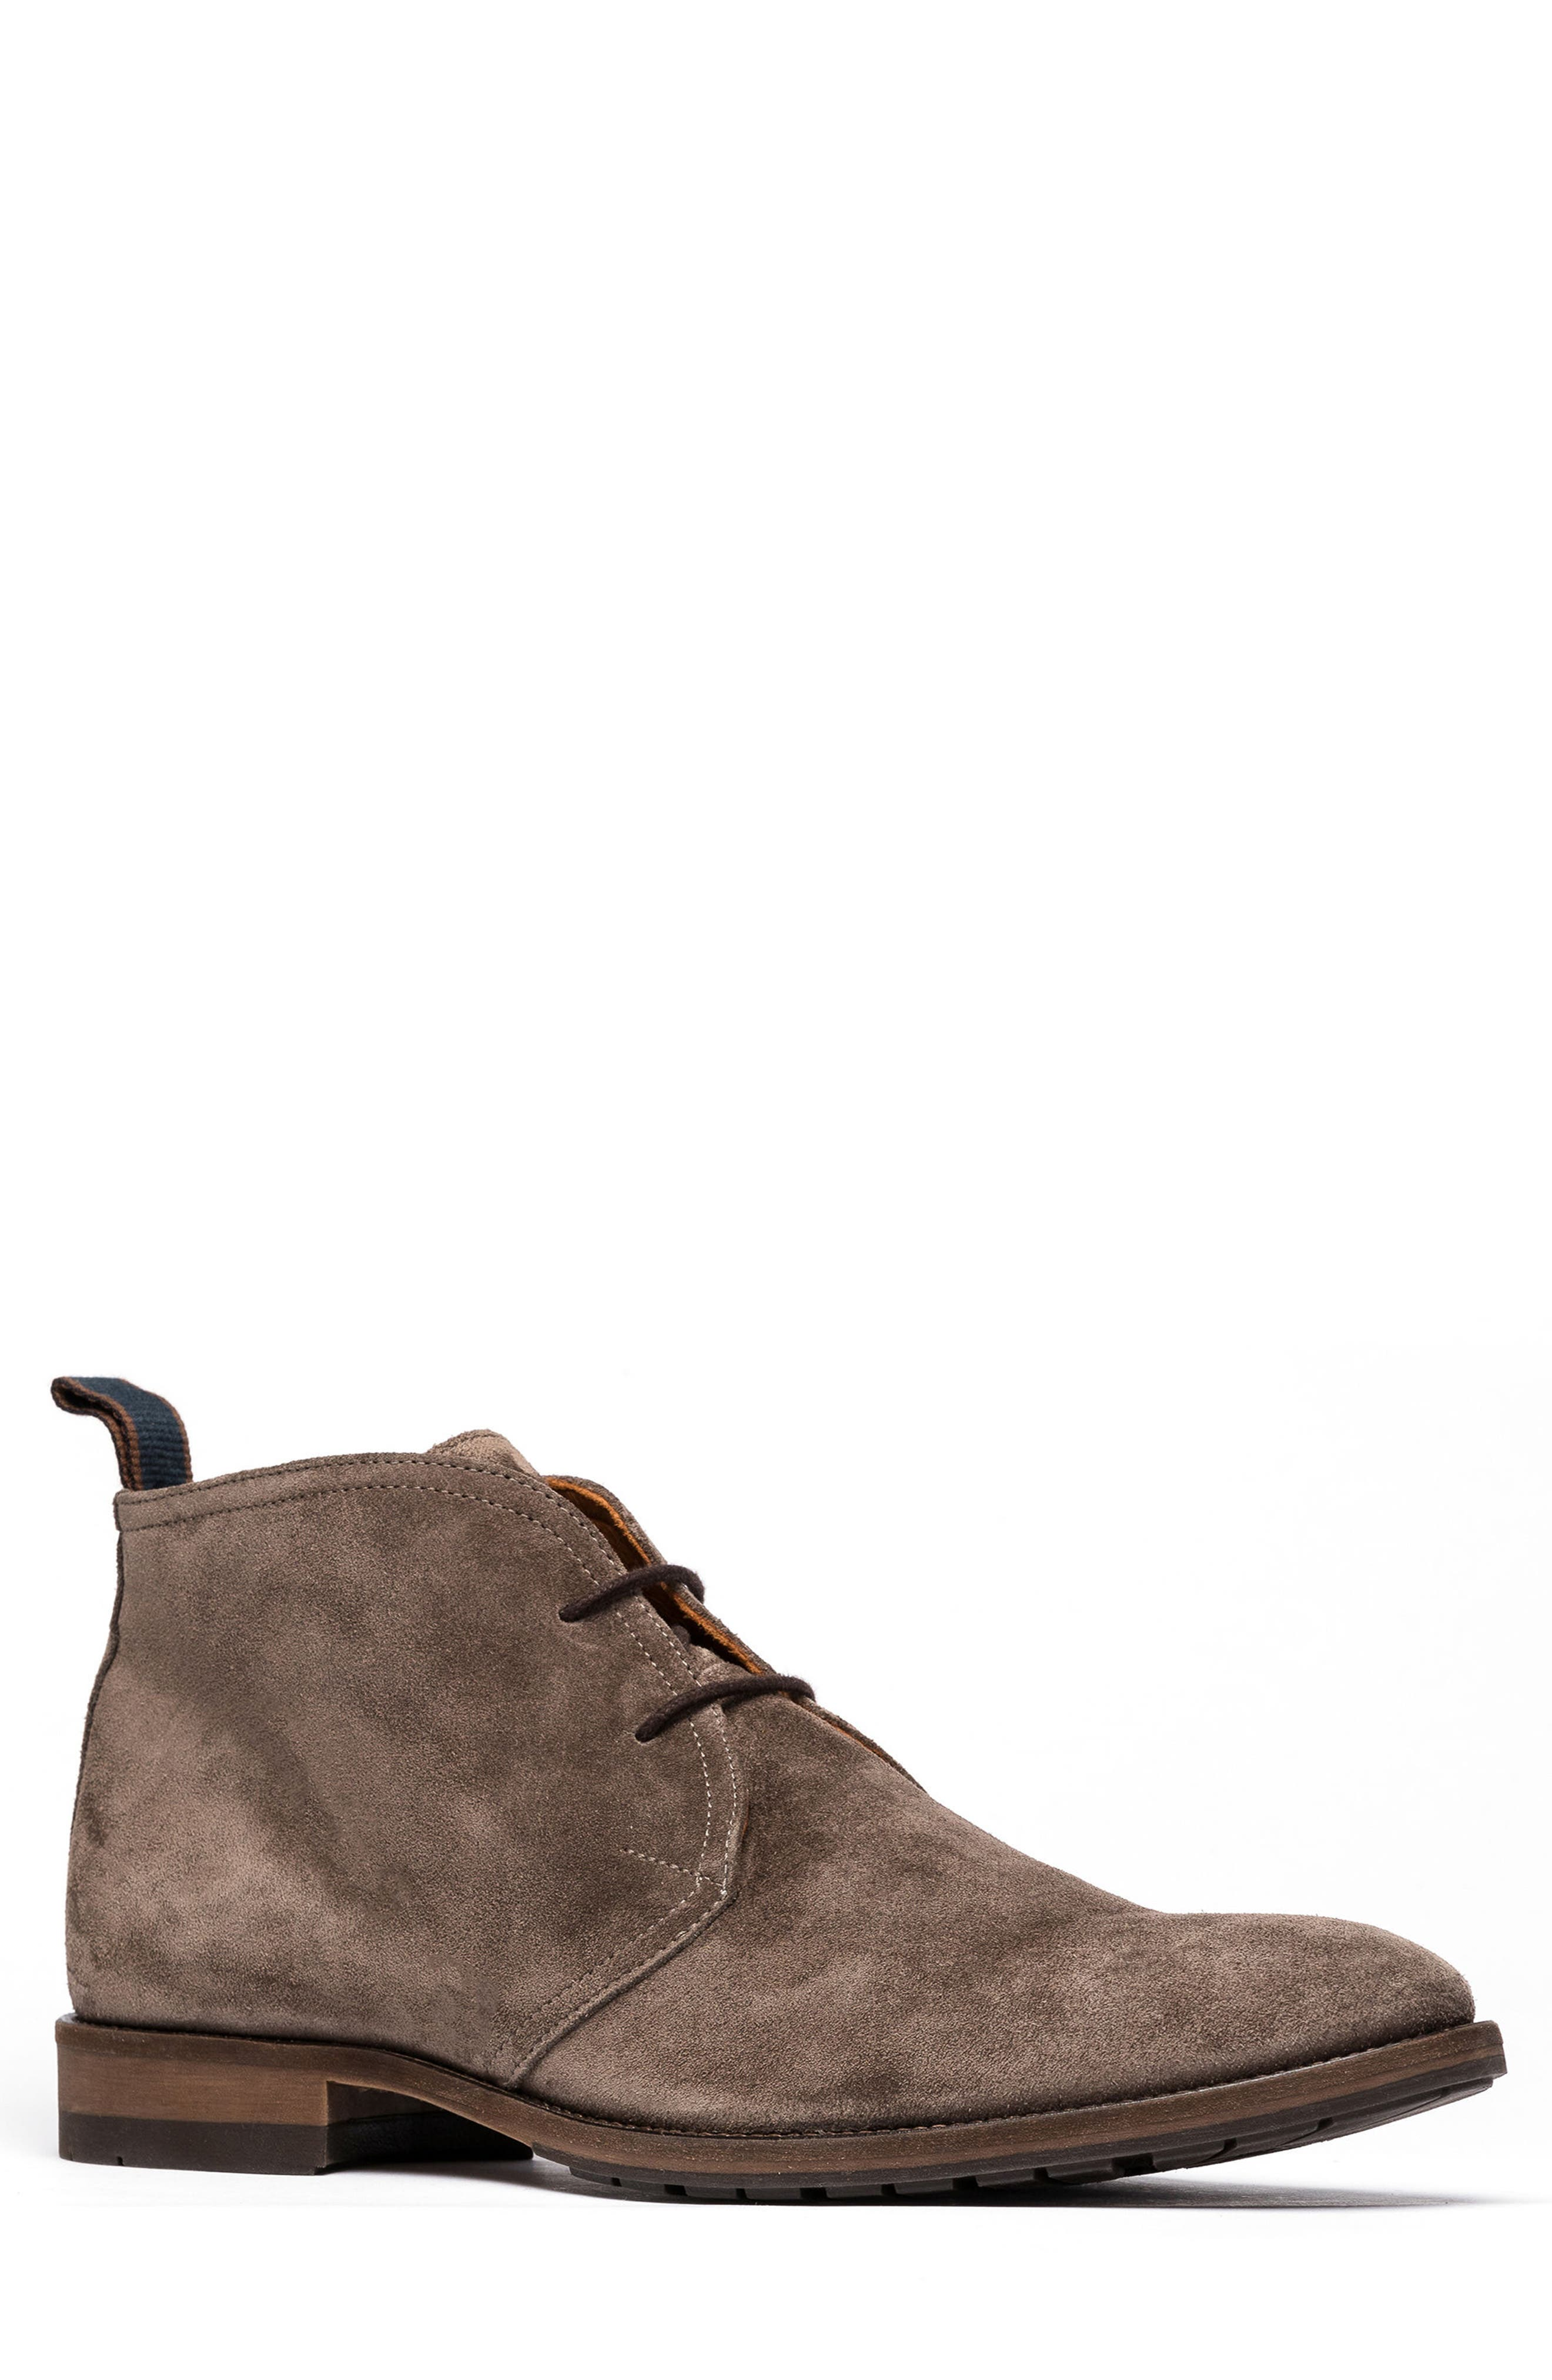 RODD & GUNN Pebbly Hill Chukka Boot, Main, color, TAUPE